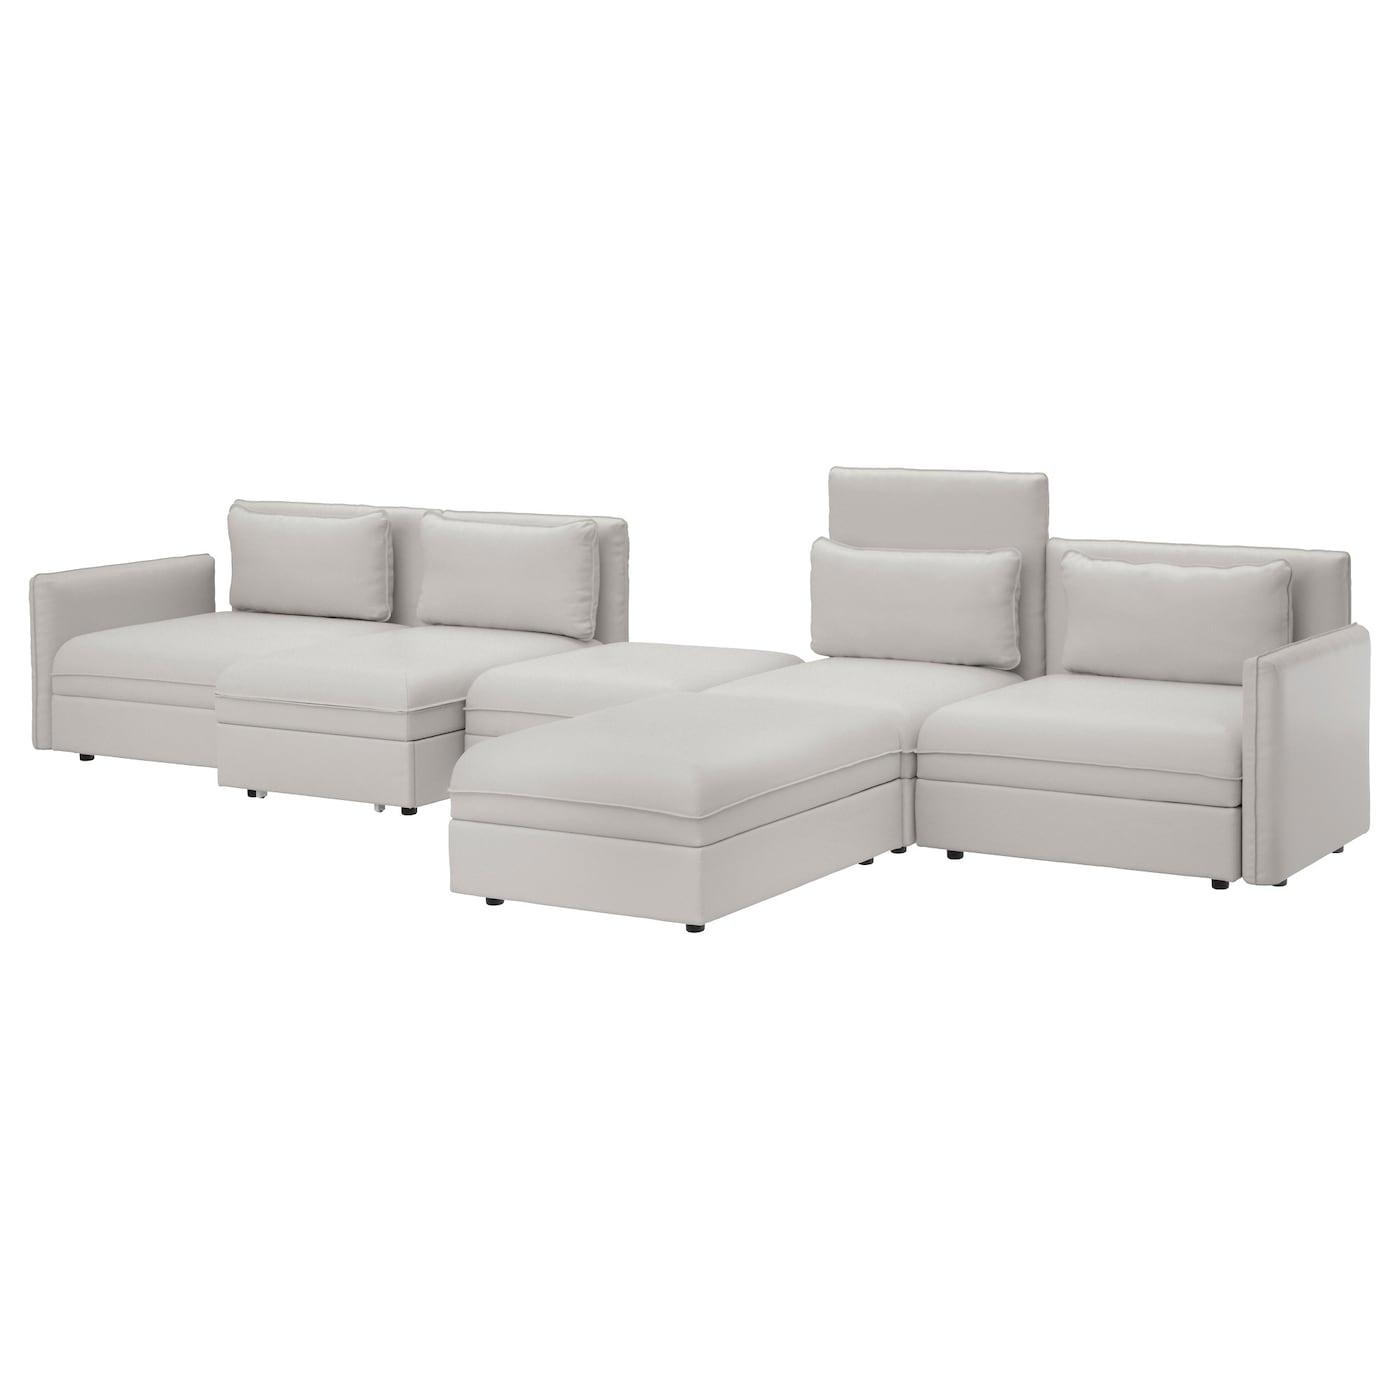 vallentuna 5 seat sofa with bed ramna light grey ikea. Black Bedroom Furniture Sets. Home Design Ideas